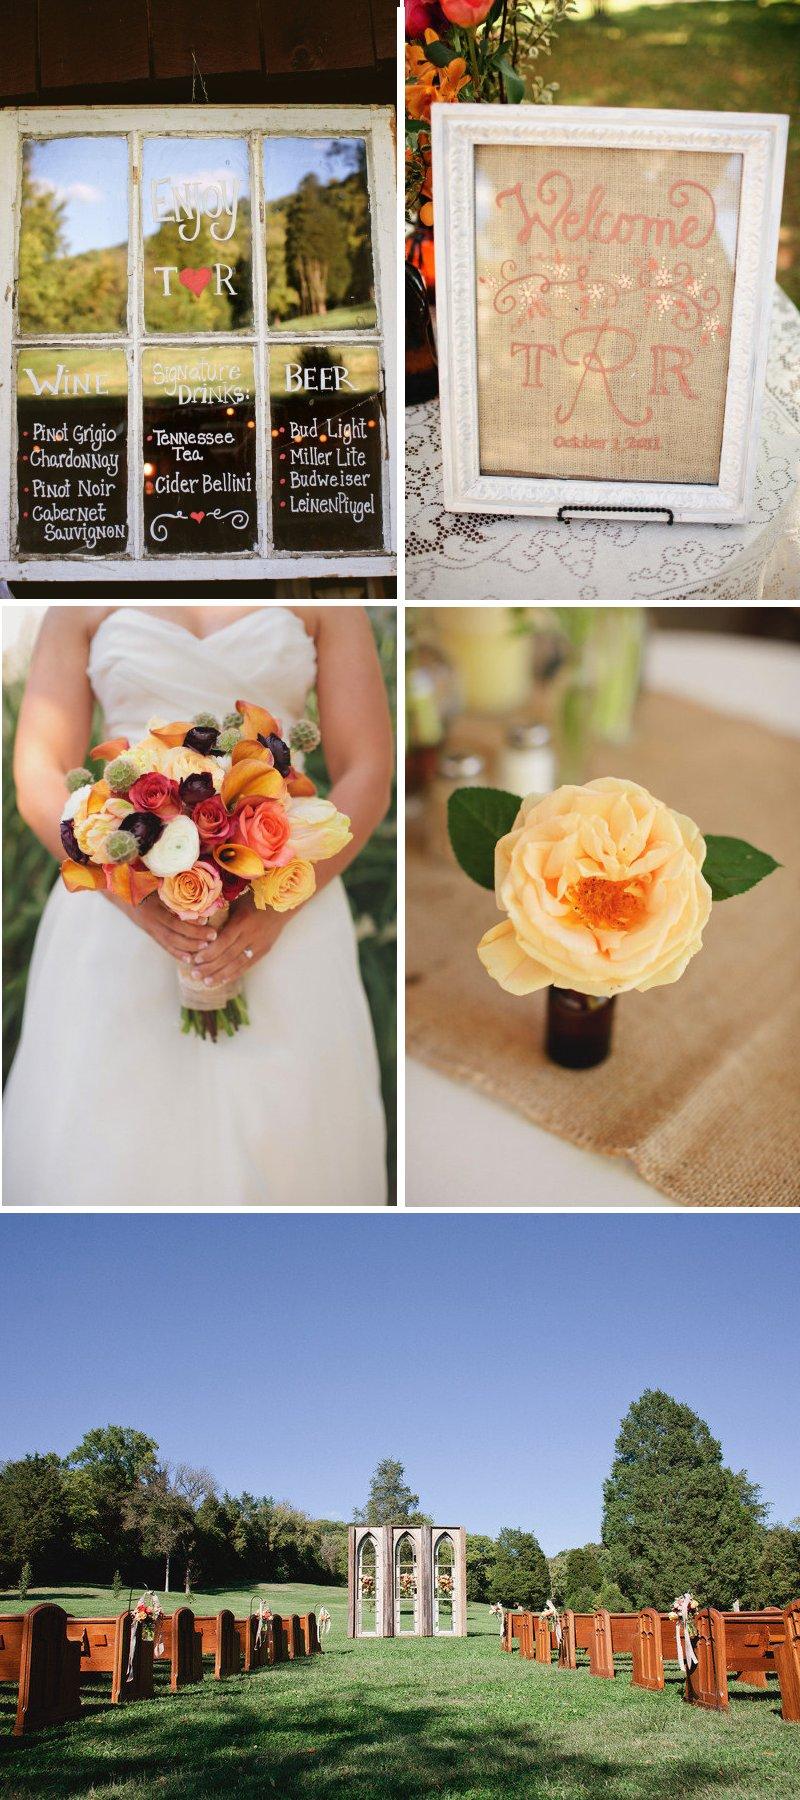 Outdoor-elegant-wedding-sweet-country-western-theme.full